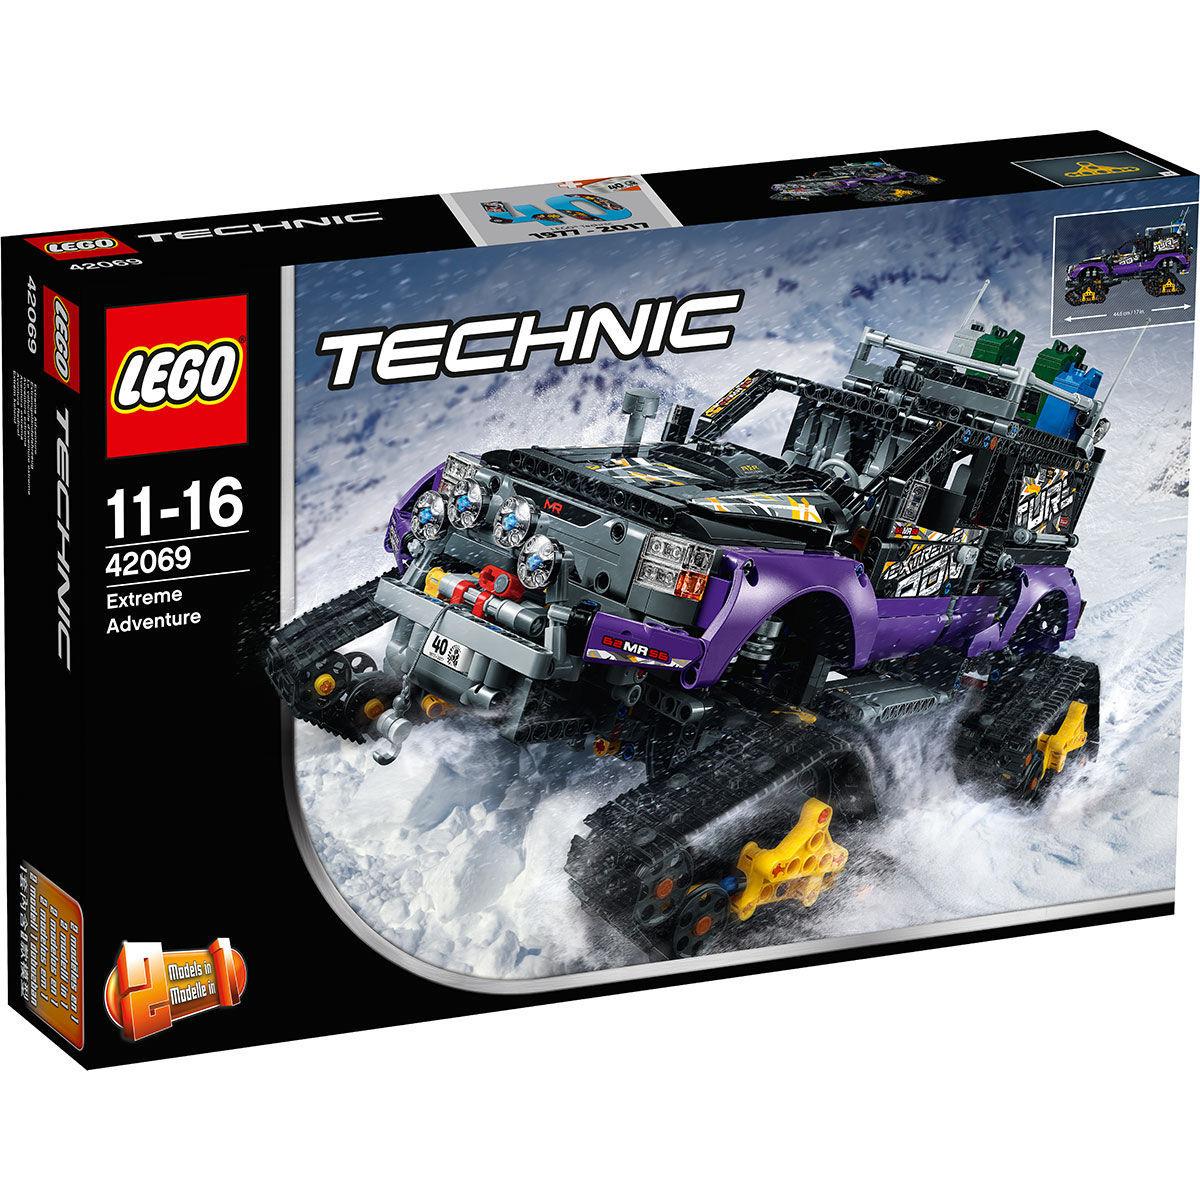 [Karstadt] LEGO Technic Extremgeländefahrzeug 42069 für 84,94 € inkl. Versand (79,99 € bei Abholung)